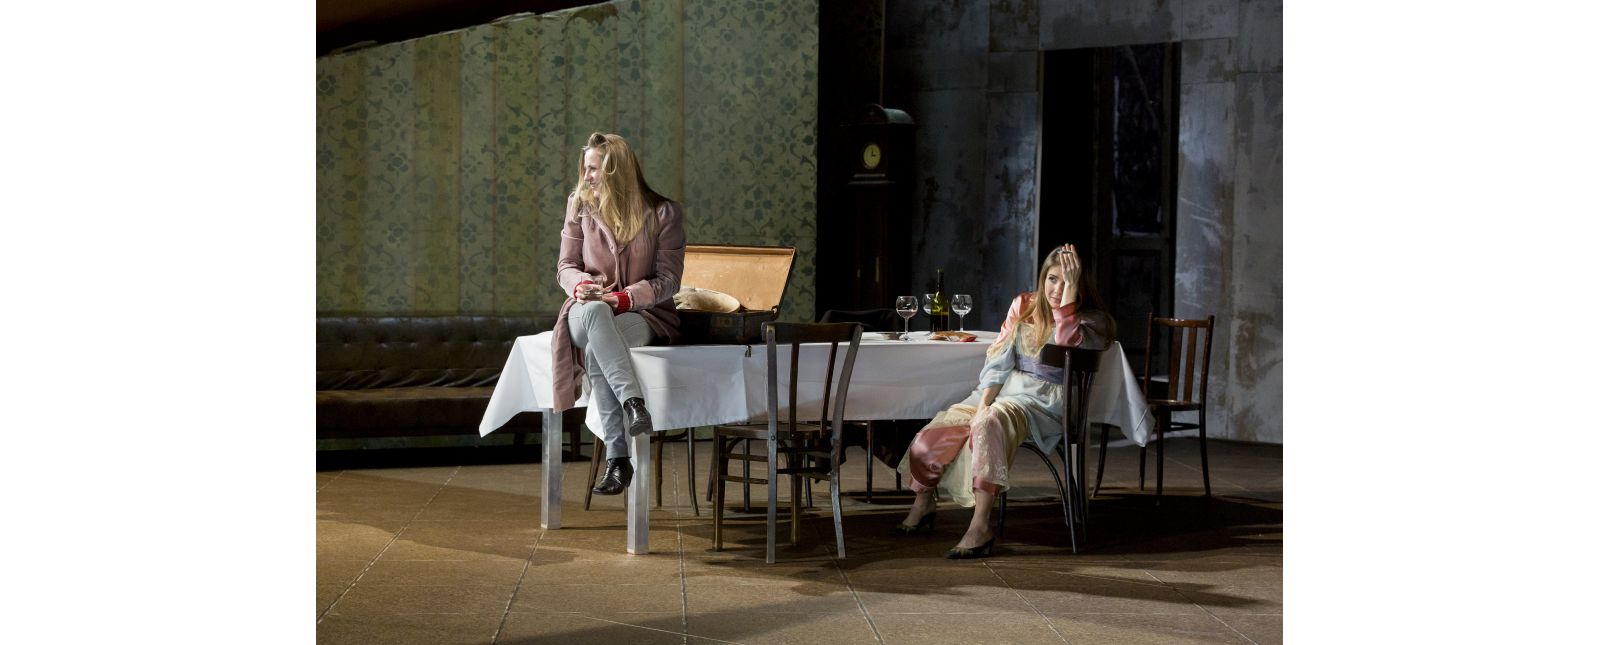 Drei Winter // Marieke Kregel, Angela Falkenhan // Rainer Muranyi // 2018